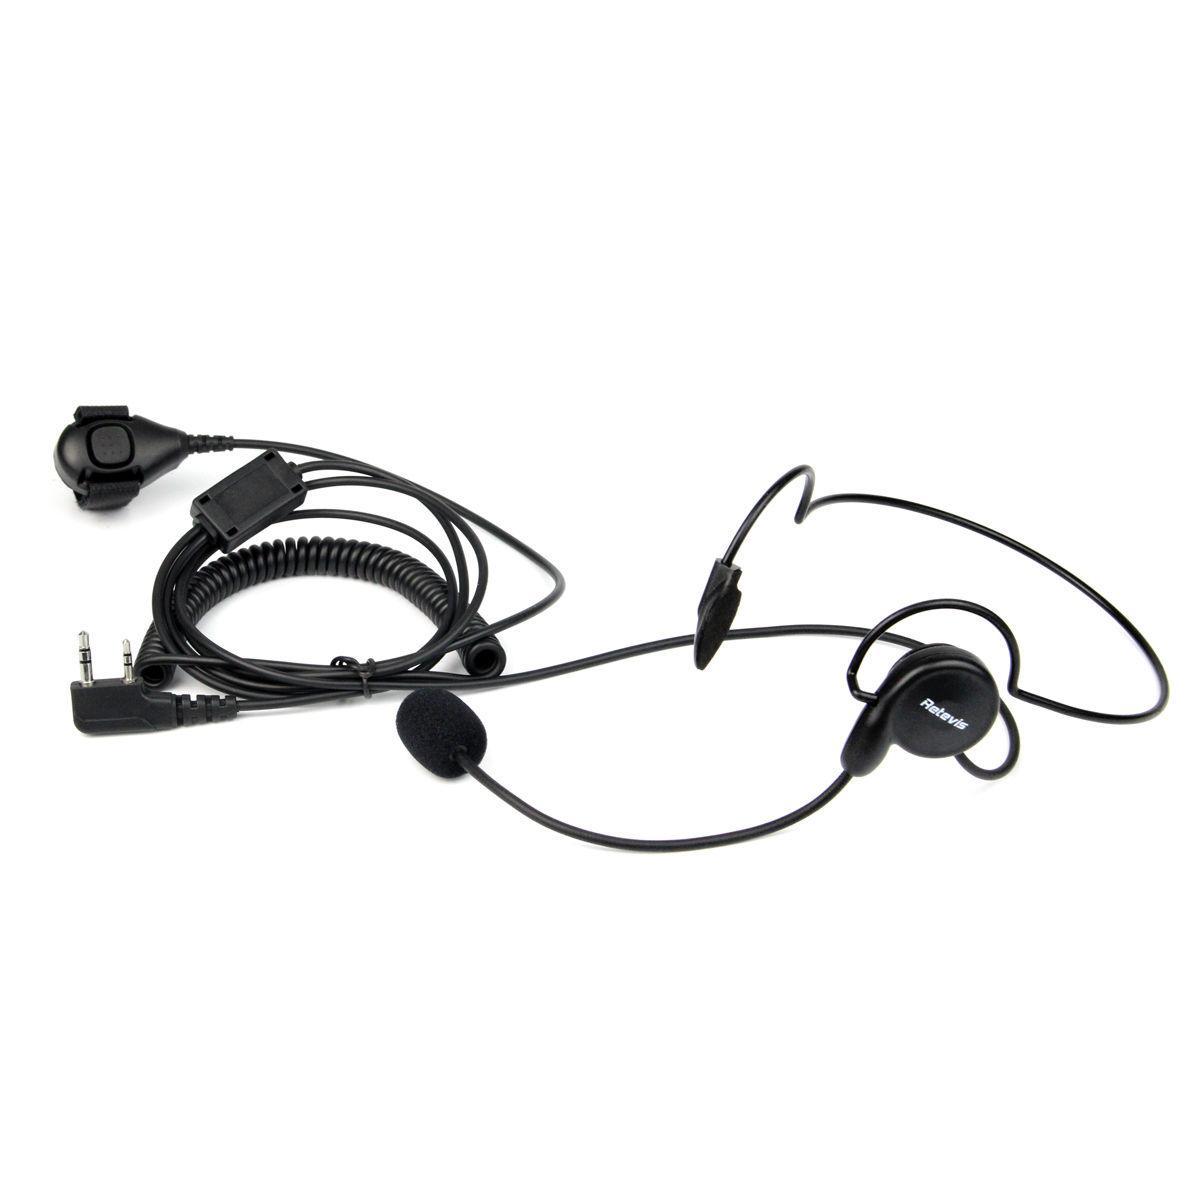 100X2Pin Earpiece Mic Finger PTT Headset for Kenwood BAOFENG WOUXUN 2-WAY Radio